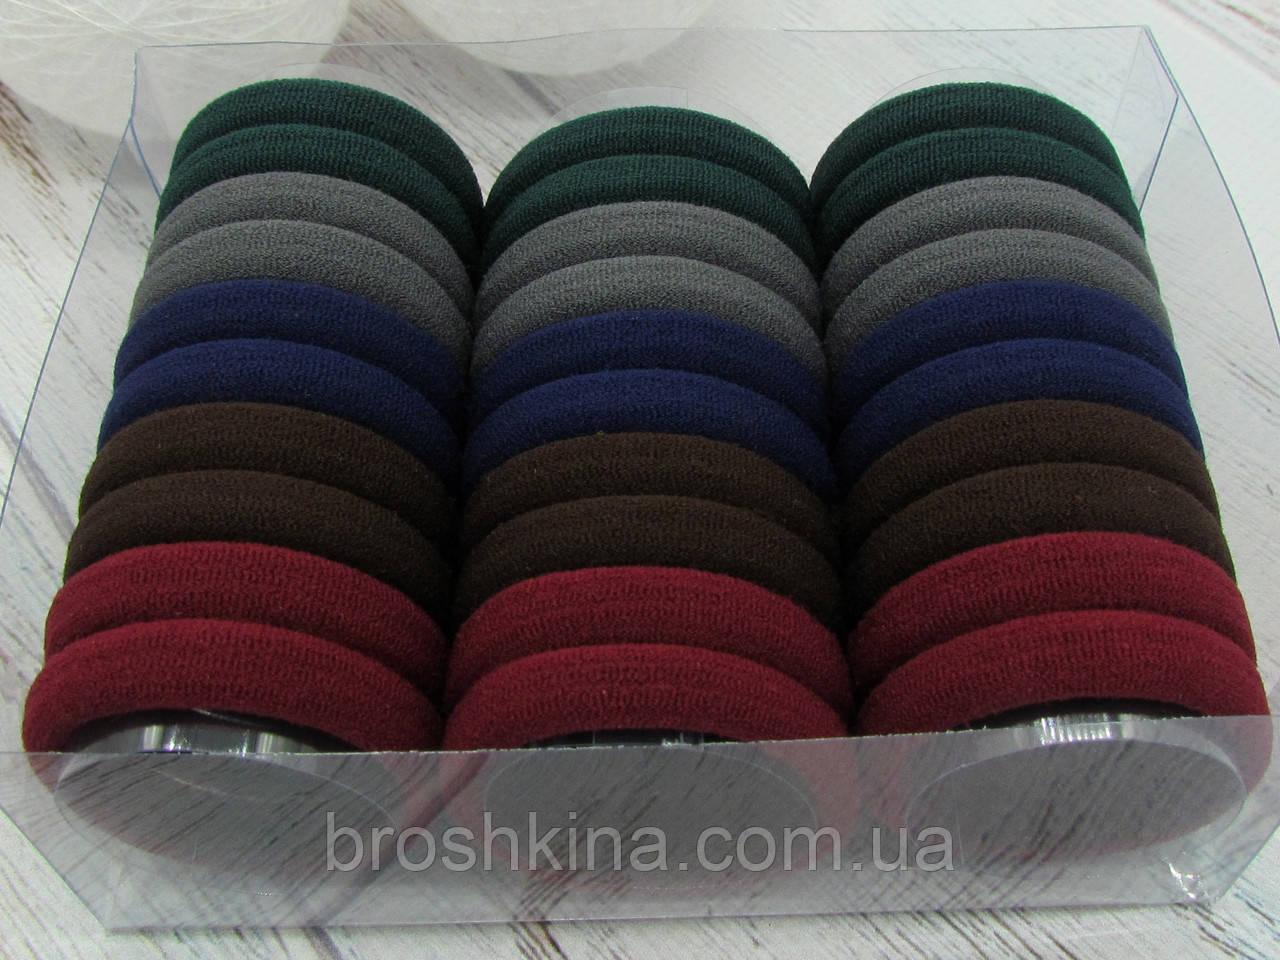 Резинки для волос Ø 4.5 см микрофибра 30 шт. в коробочке